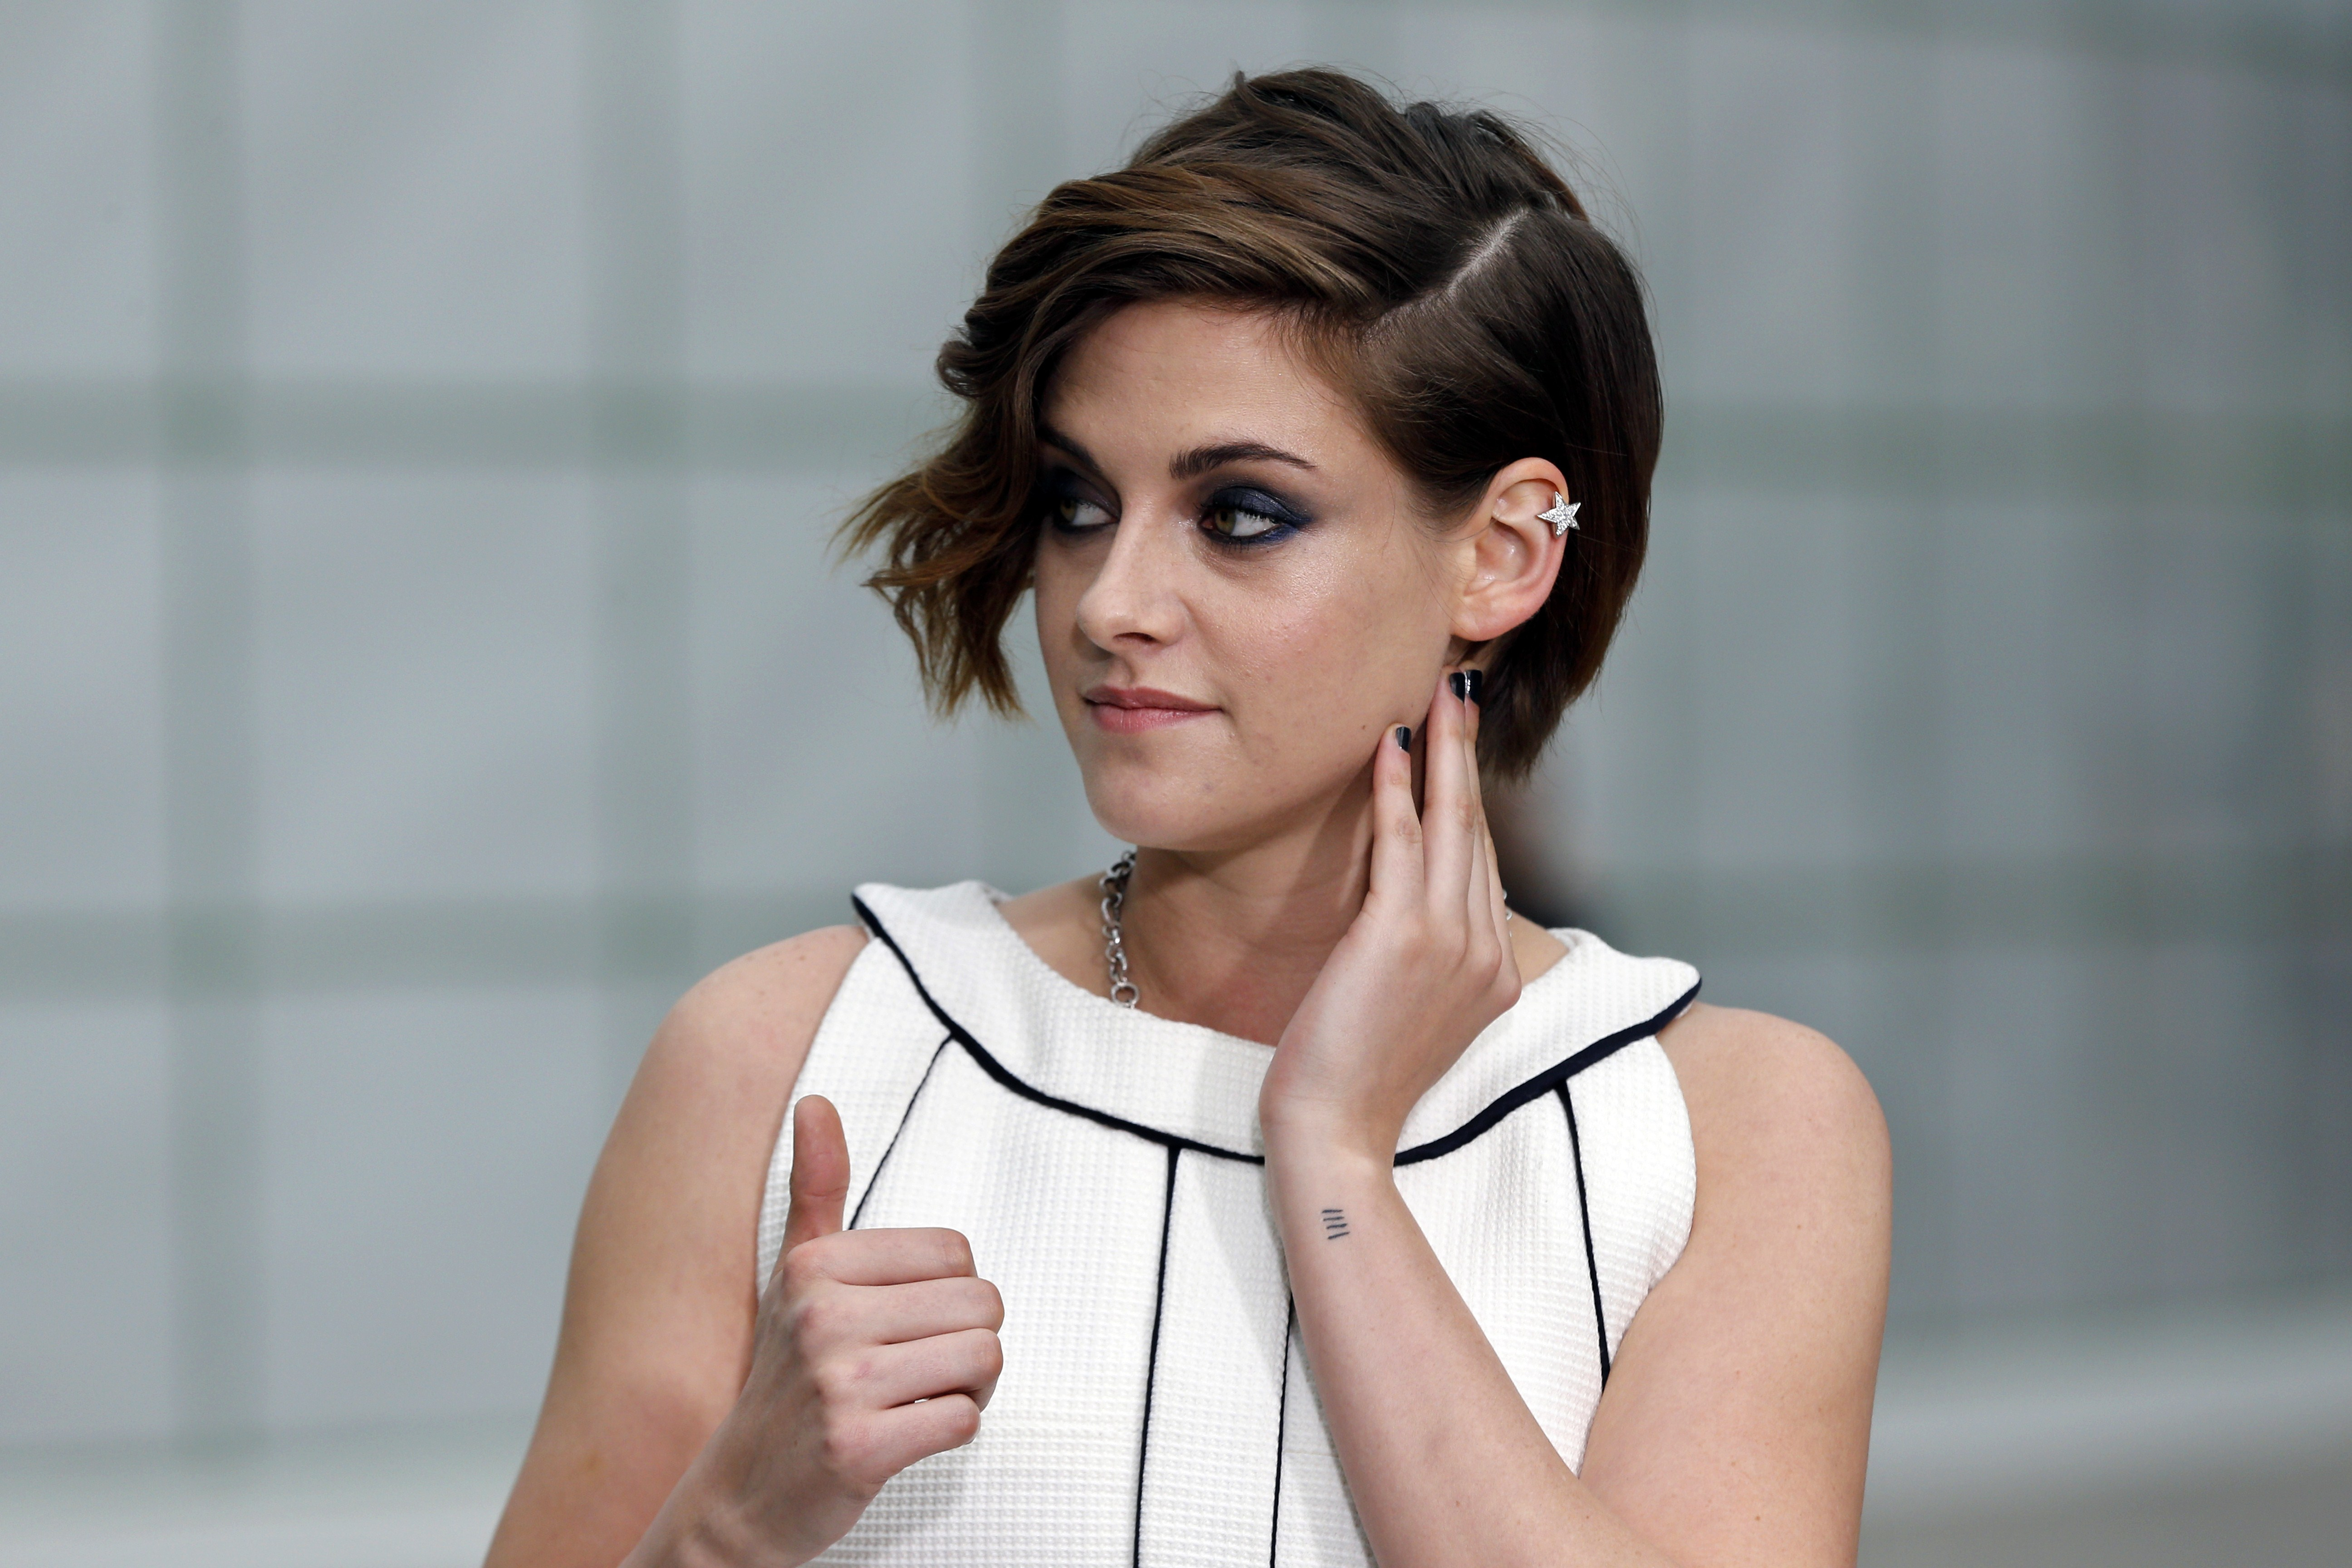 Kristen Stewart's Resting Bitch Face Comeback & 4 Other Things Women